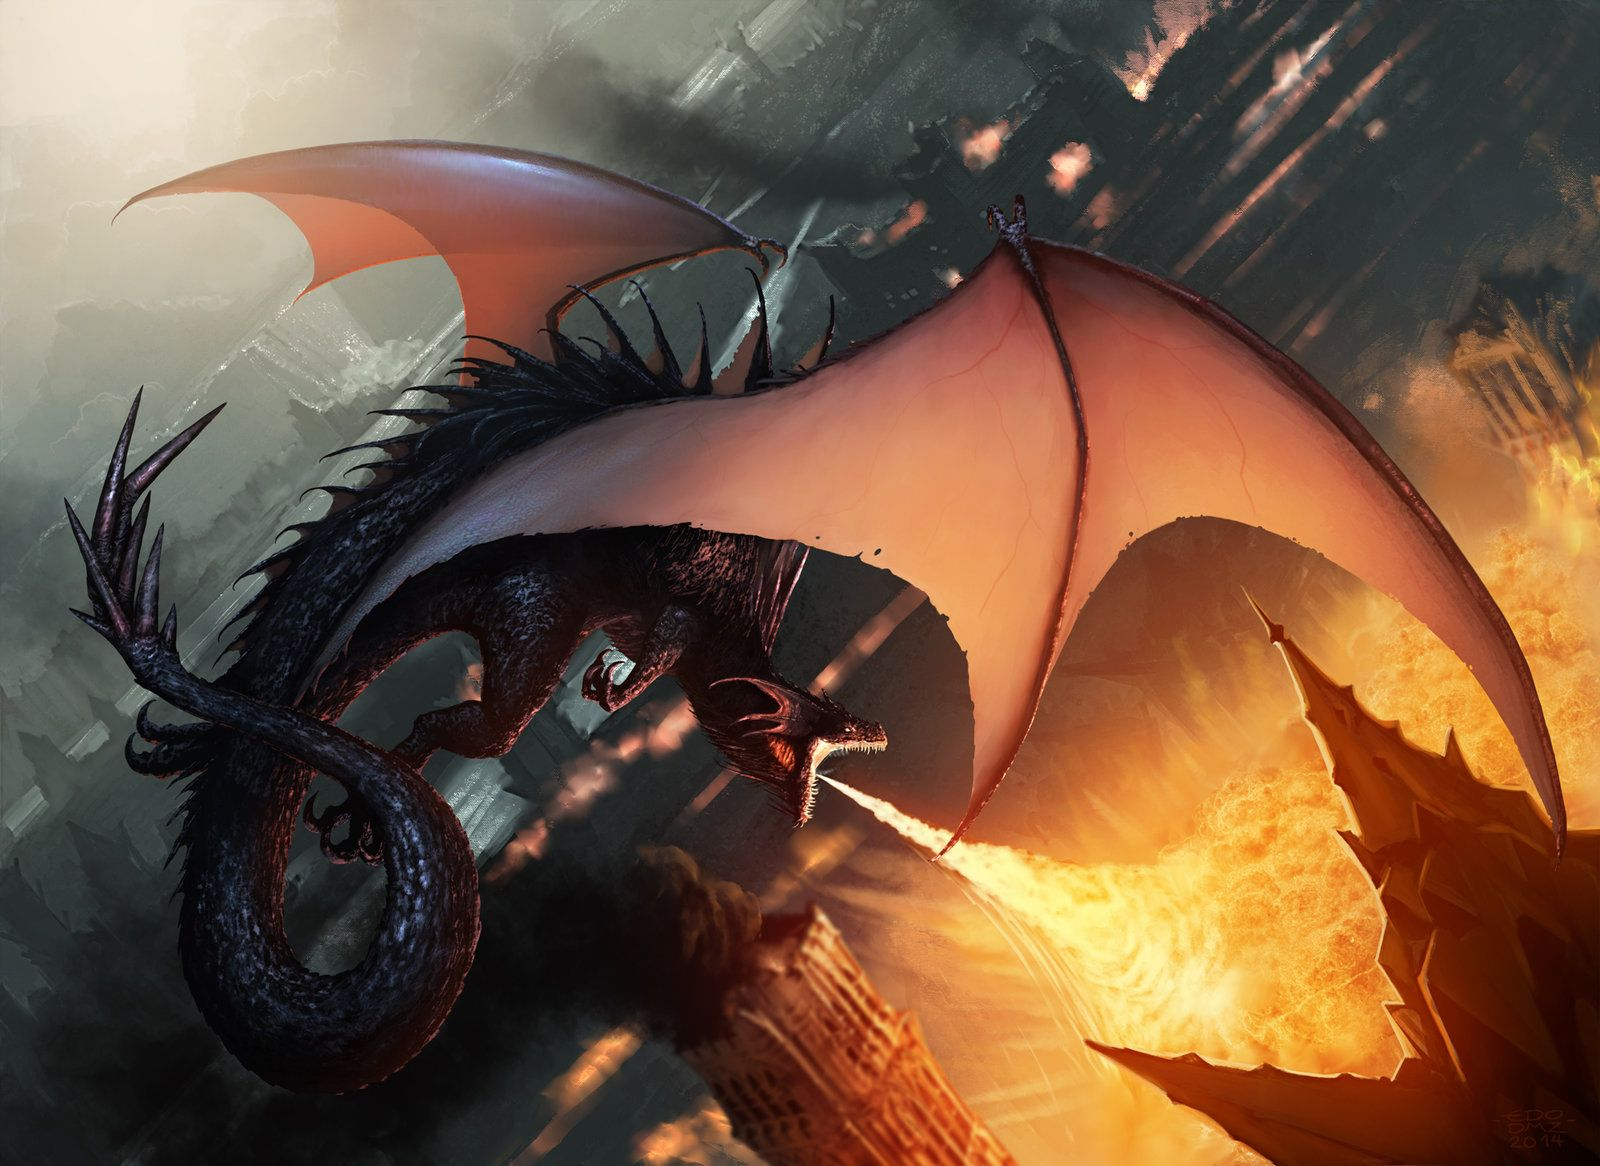 Dragon+attack+by+edsfox deviantart com+on+@deviantART | Comics